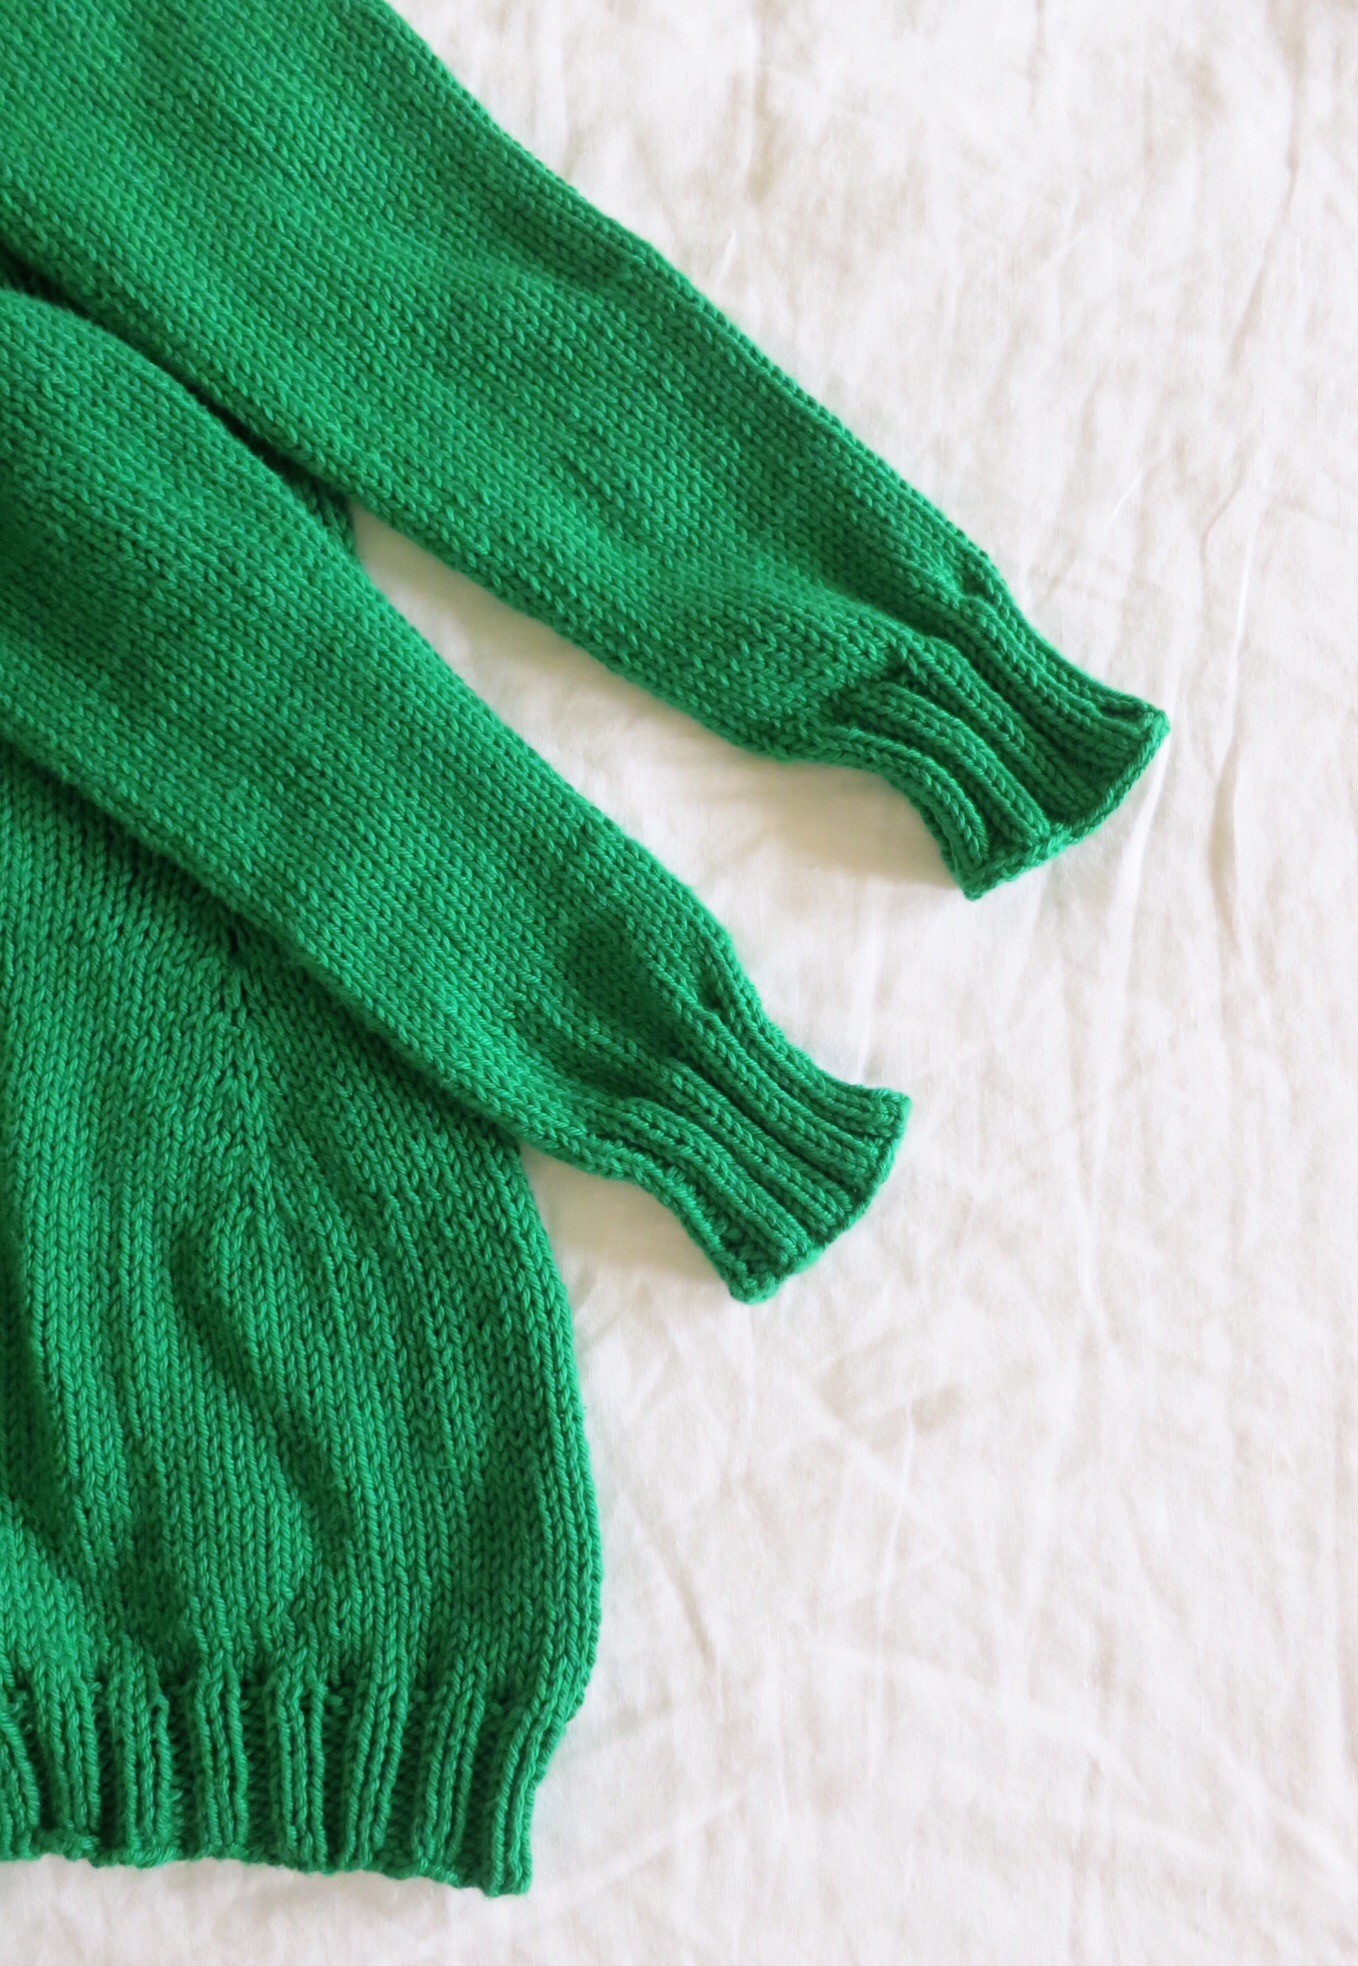 Green knit cardigan in progress